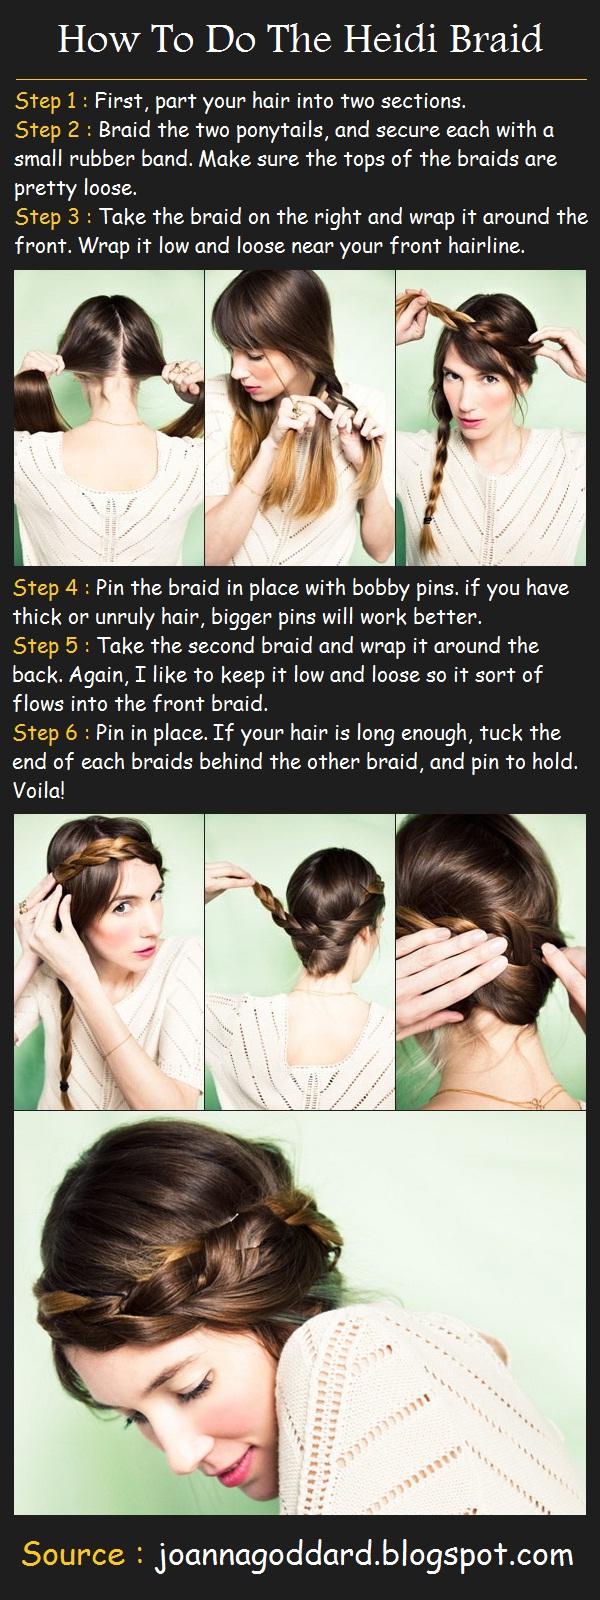 How To Do The Heidi Braids Step By Step Hairstylescut How To Braid Hair  Near Forehead